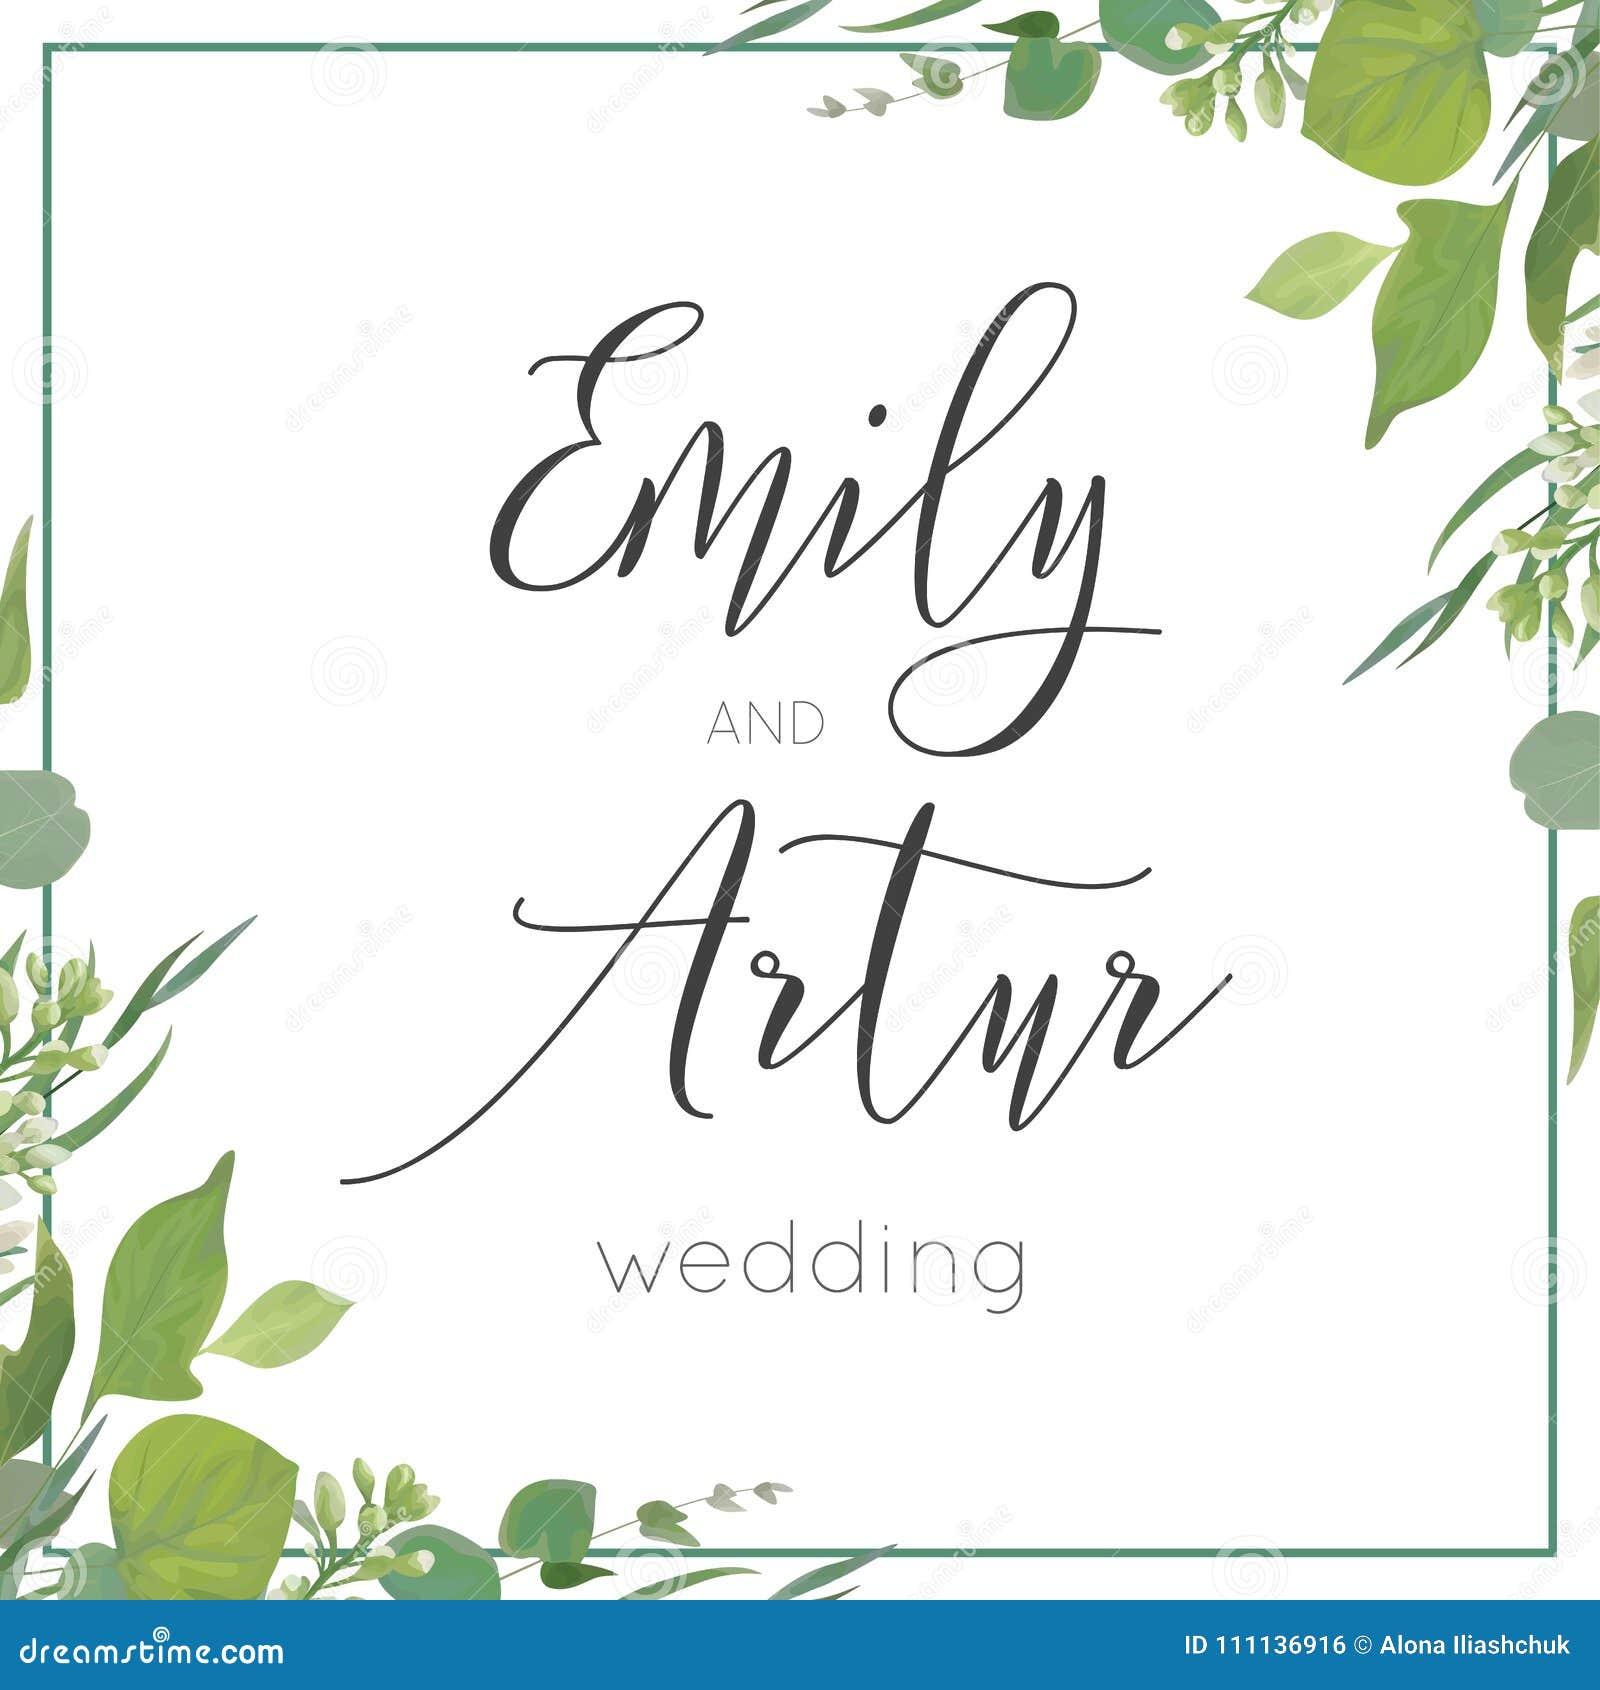 Wedding Invitation, Invite, Save The Date Card Design. Green Wat ...